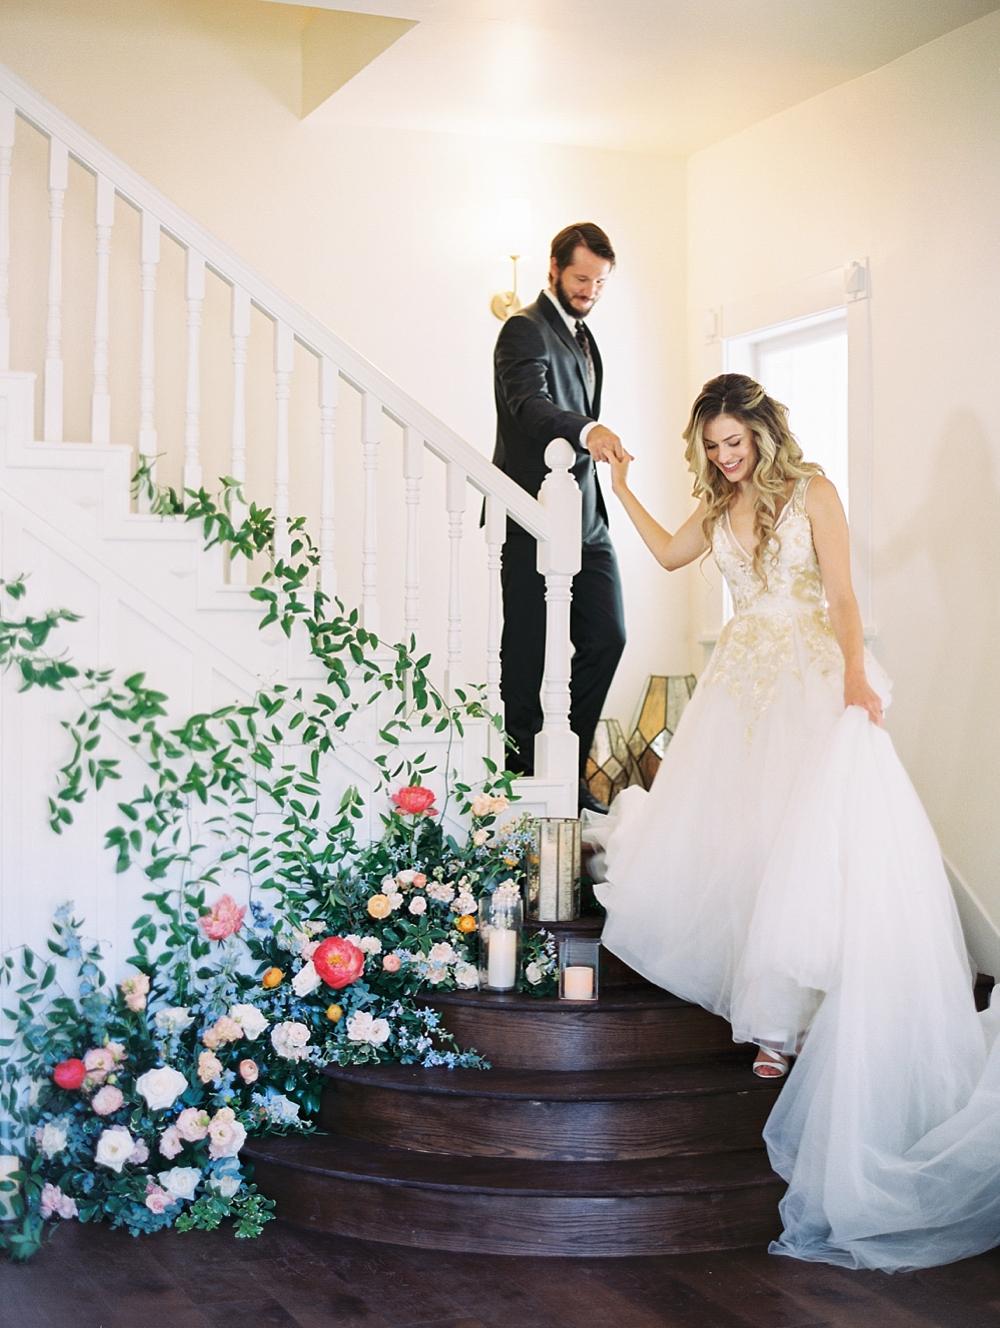 Kristin-La-Voie-Photography-Austin-Wedding-Photographer-the-grand-lady-62